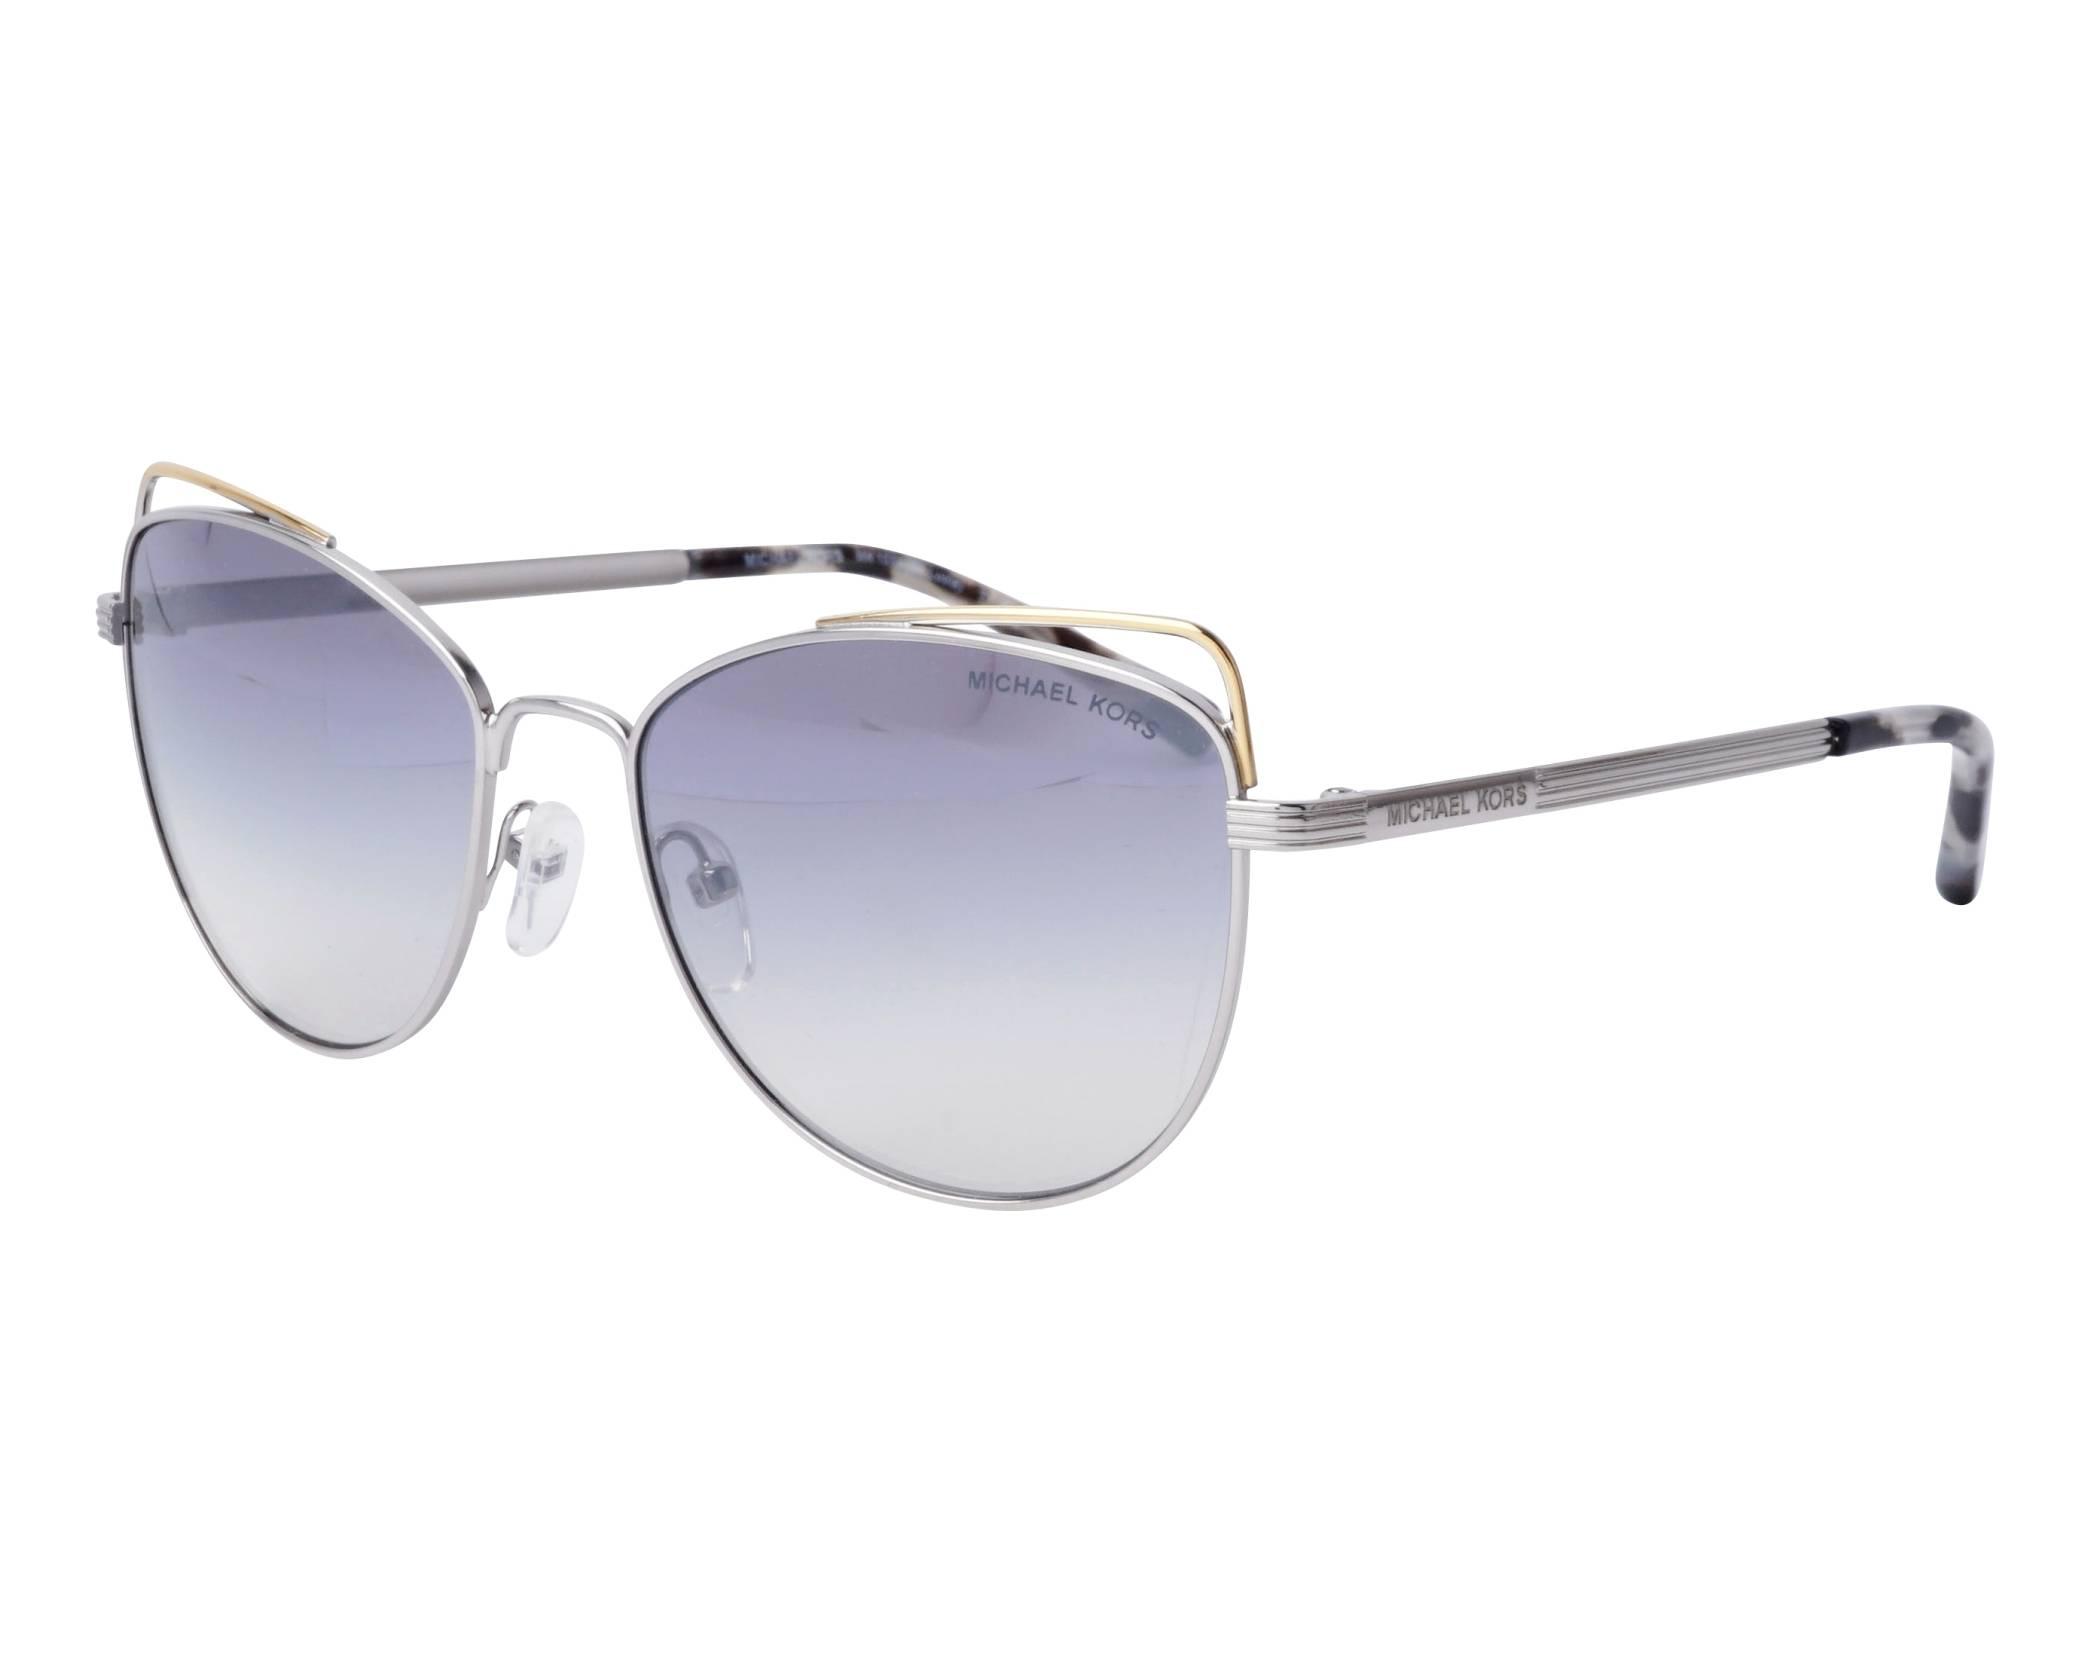 8cf45ba0ff Sunglasses Michael Kors MK-1035 11537B 55-17 Silver Gold profile view